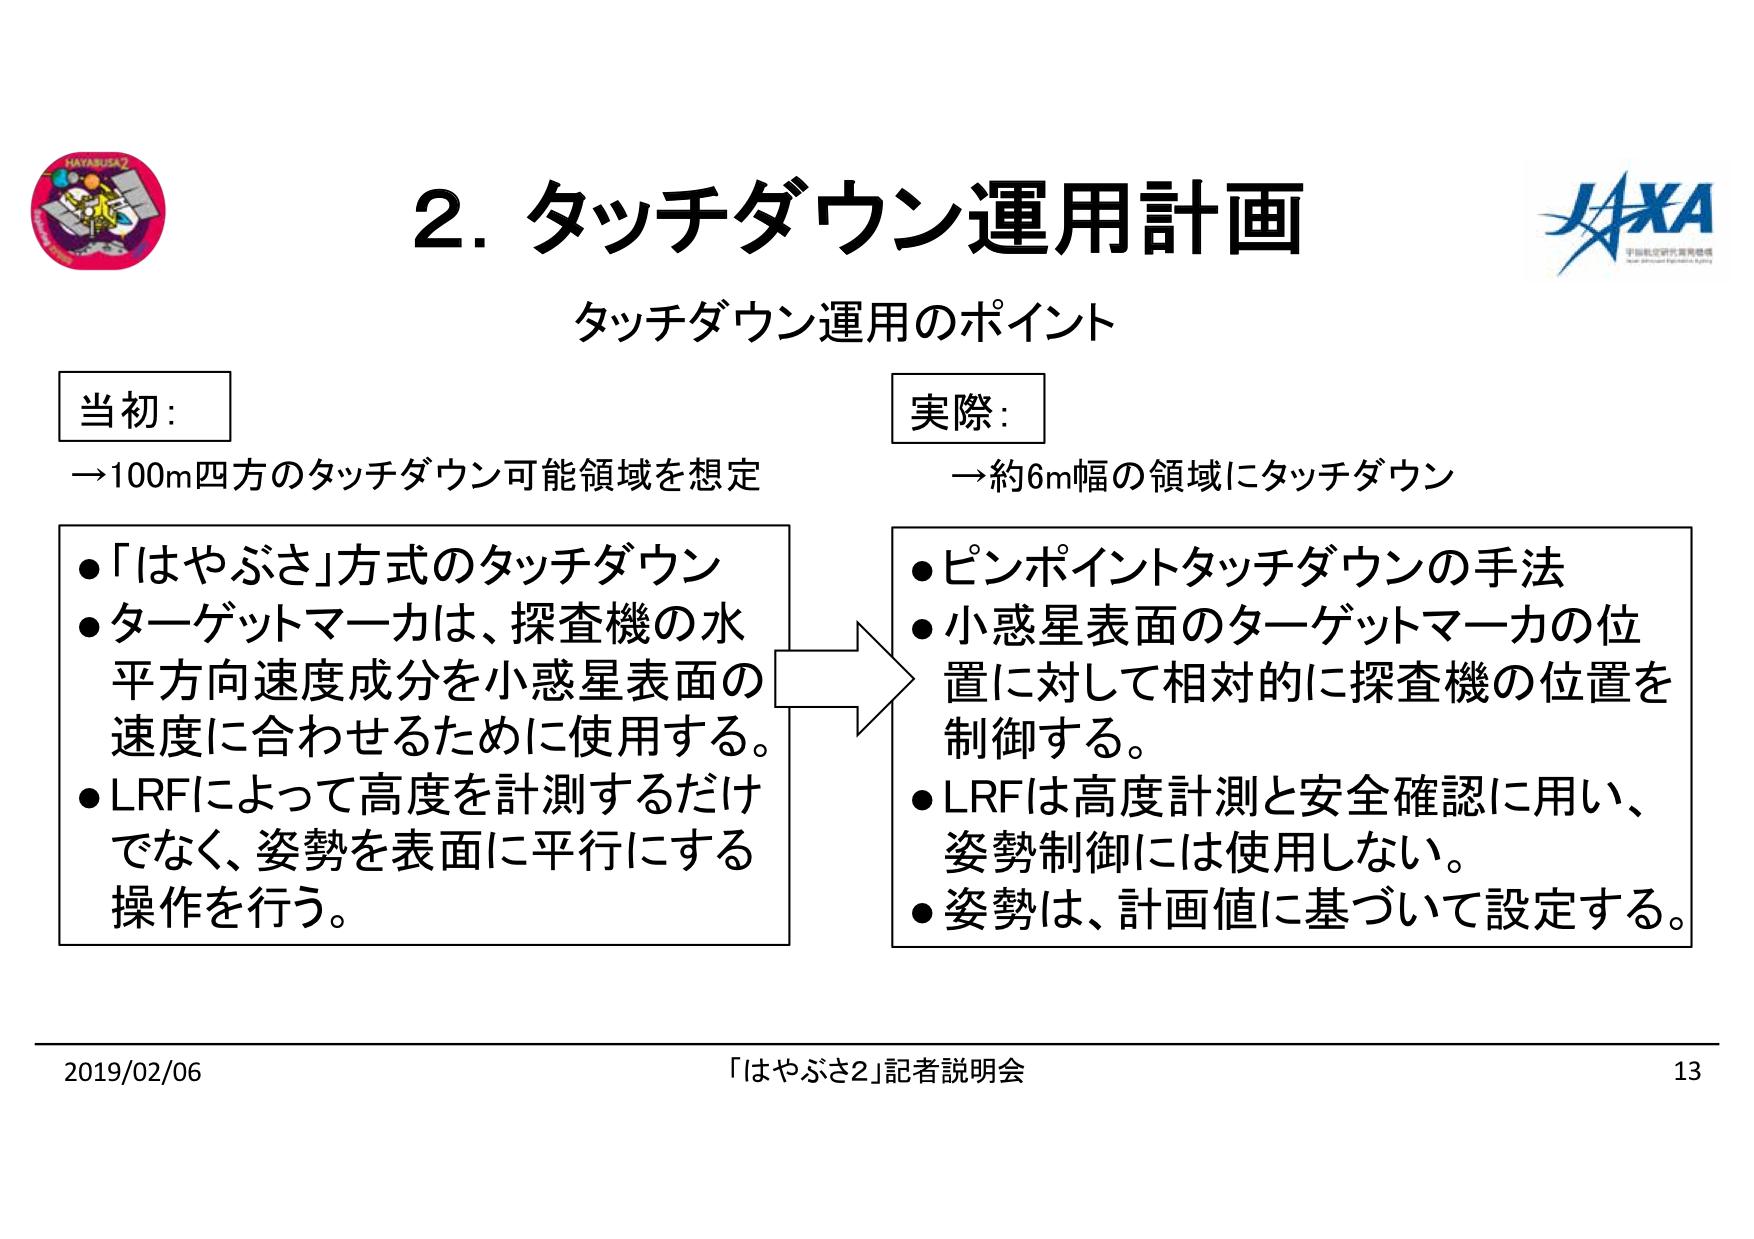 f:id:Imamura:20190204175507p:plain